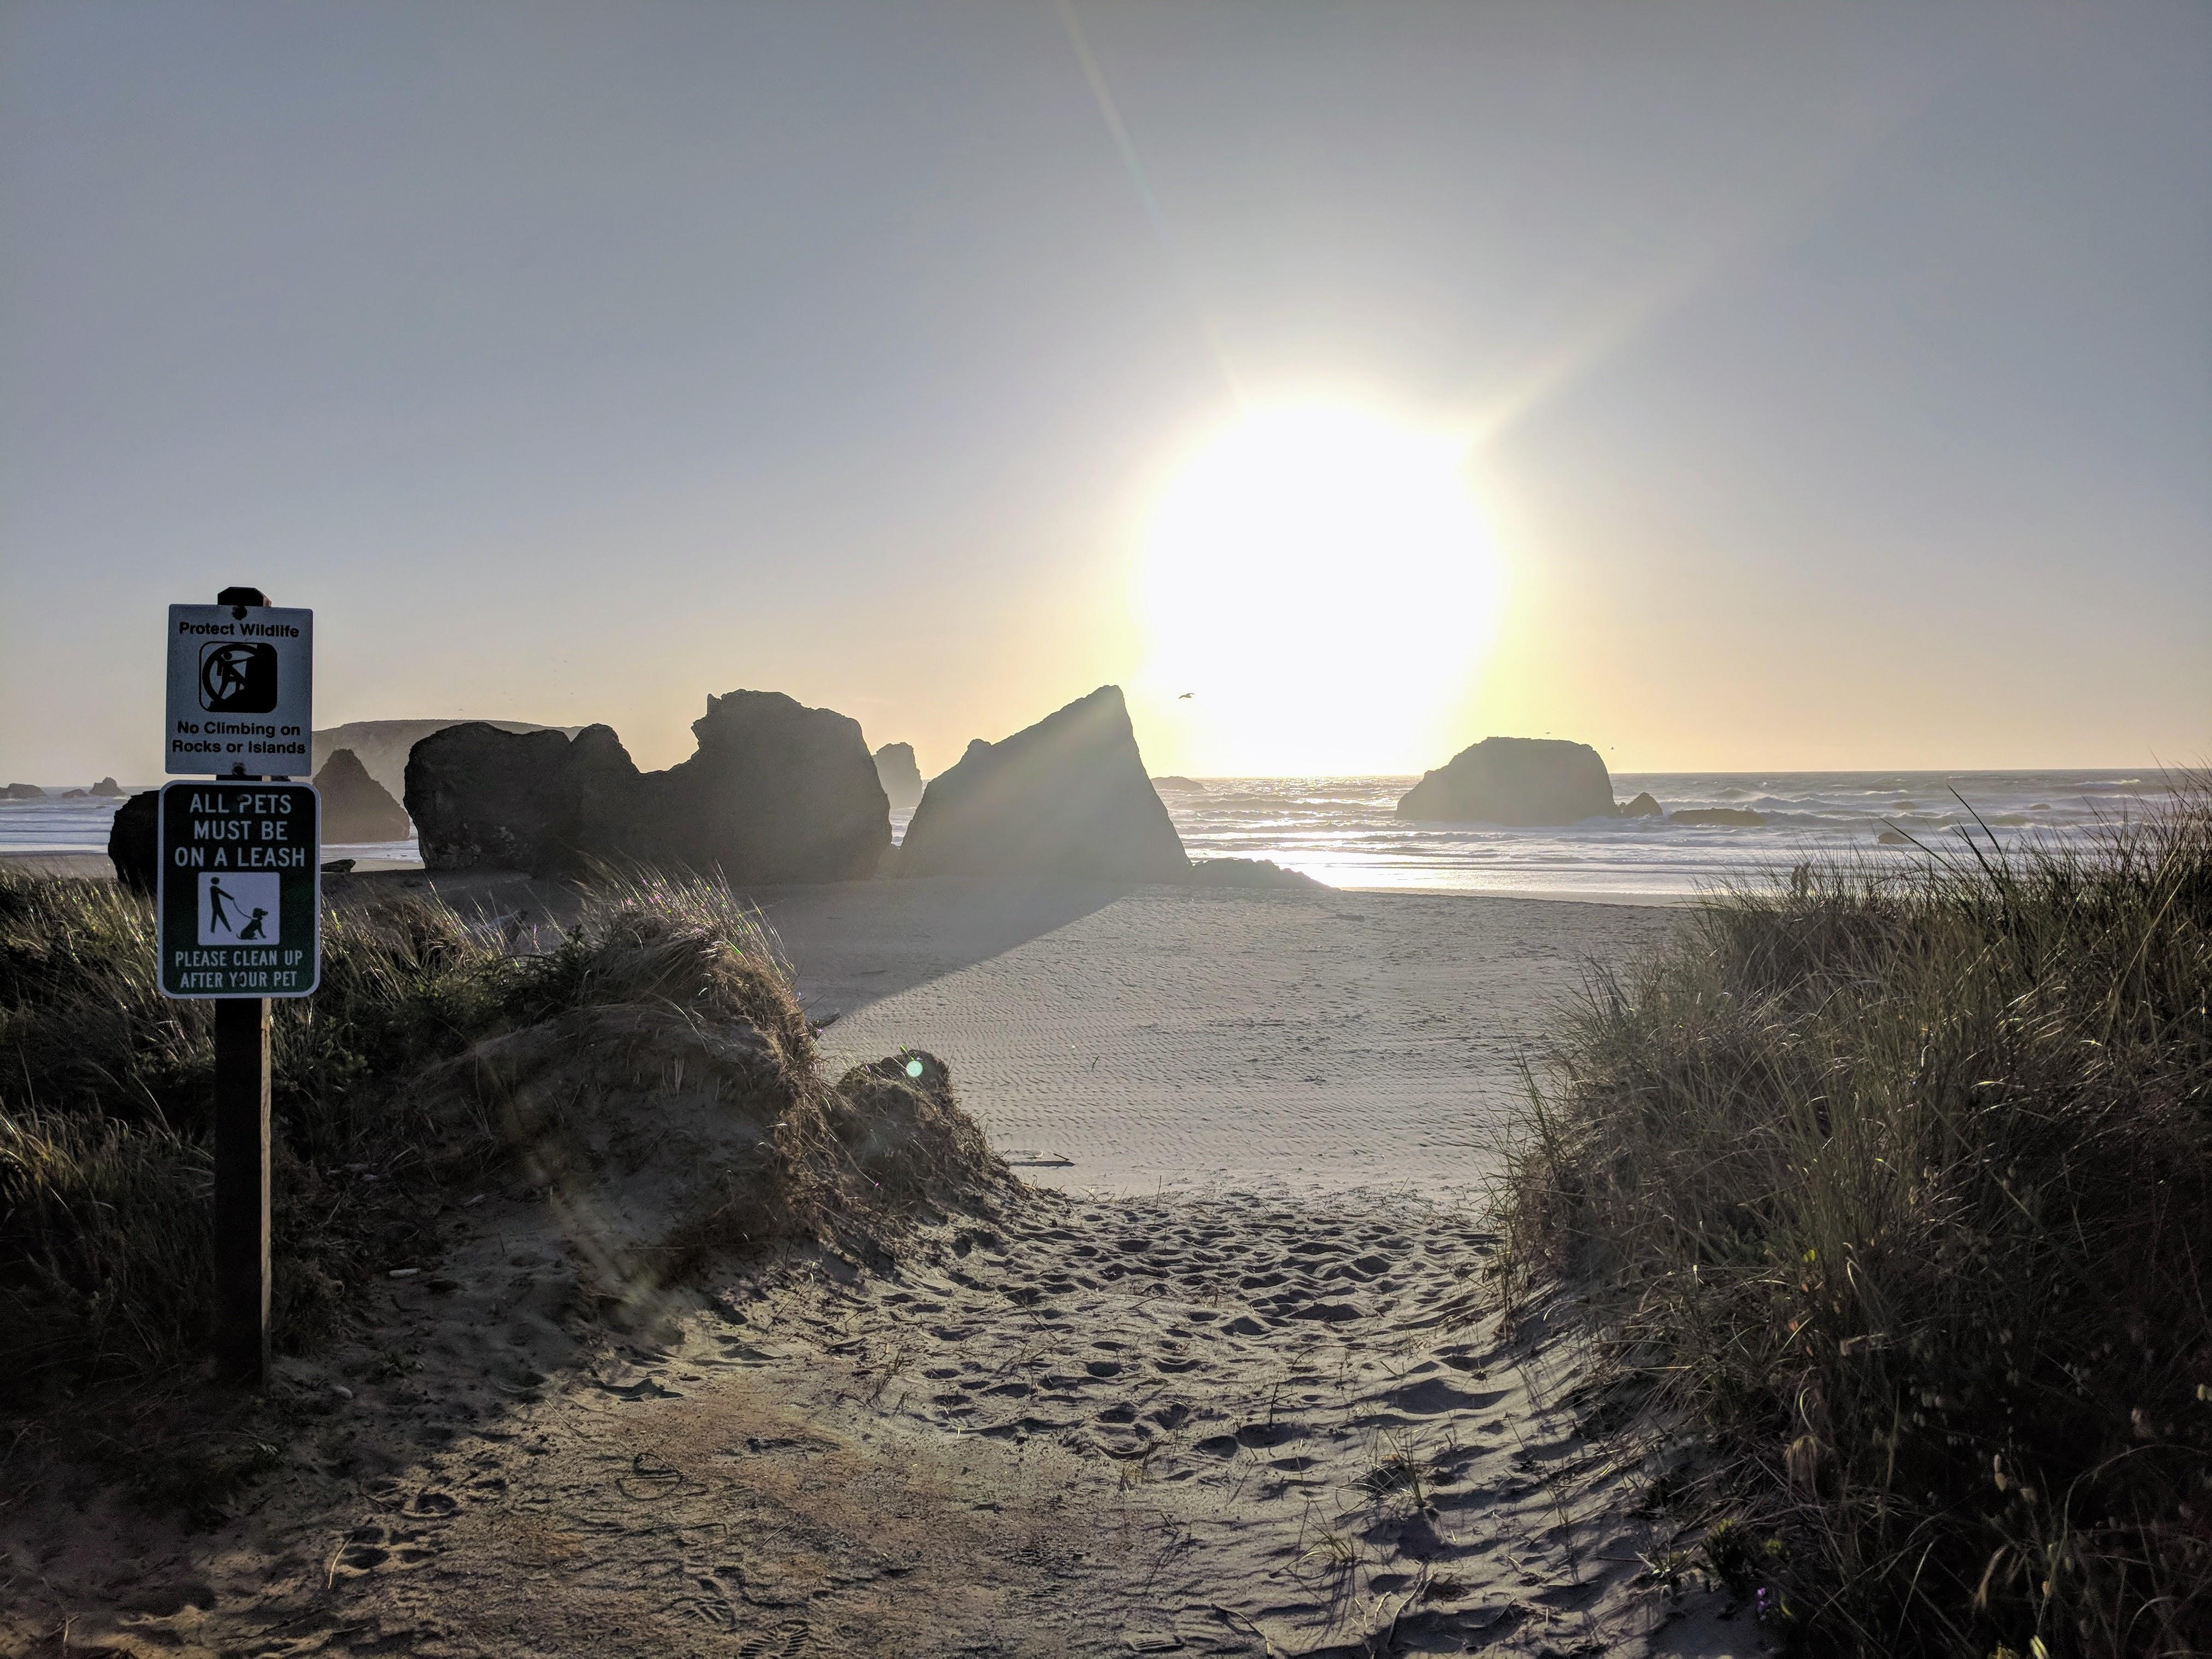 The Best Bandon Camping 2020 - Tripadvisor